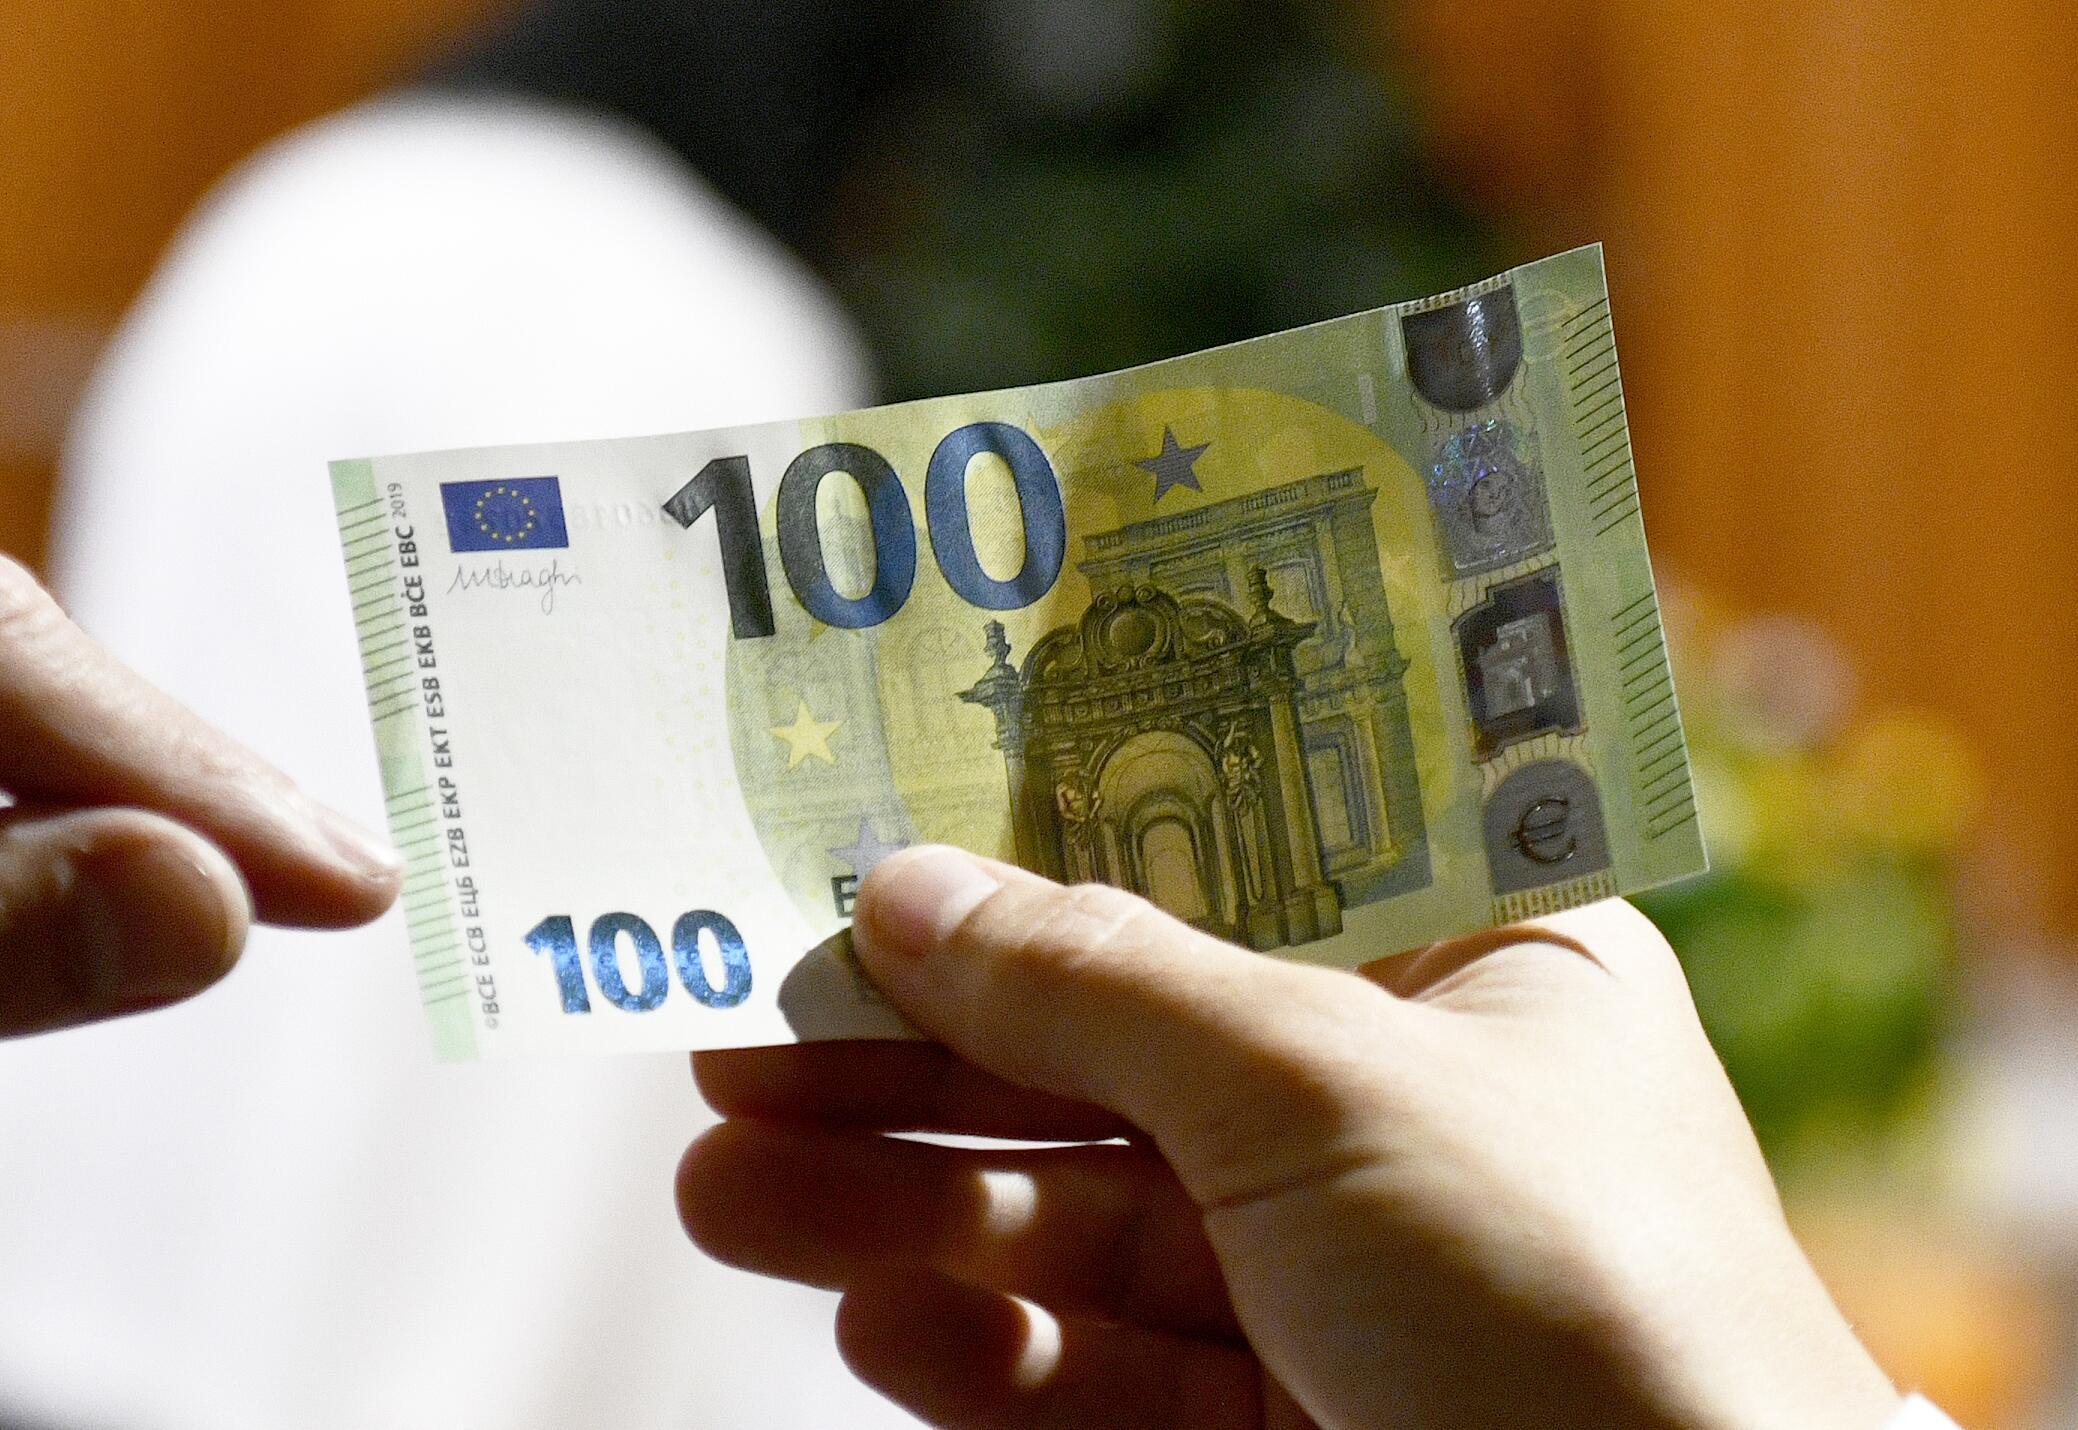 ЕЦБ представил новые банкноты номиналом €100 и €200, ЕЦБ, банкнота, 100 евро, 200 евро